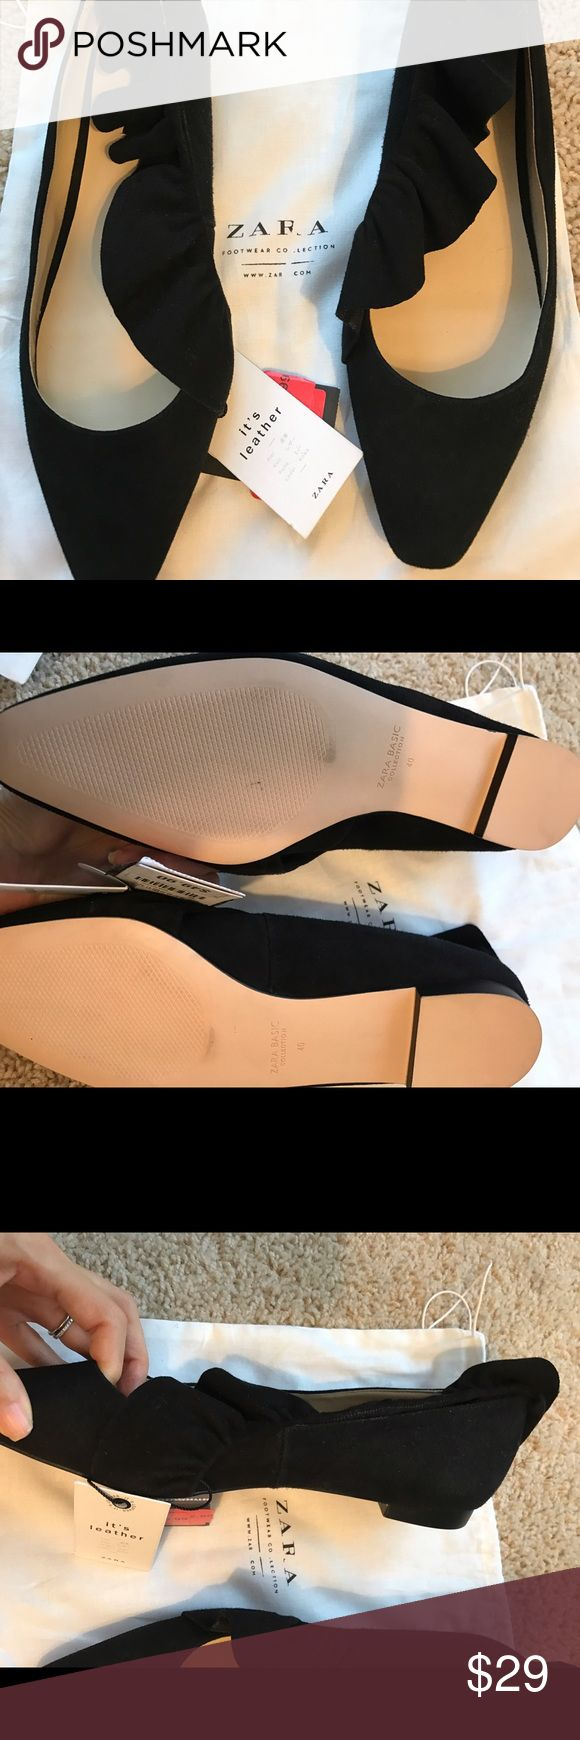 Zara black flats nwt Zara flats Zara Shoes Flats & Loafers